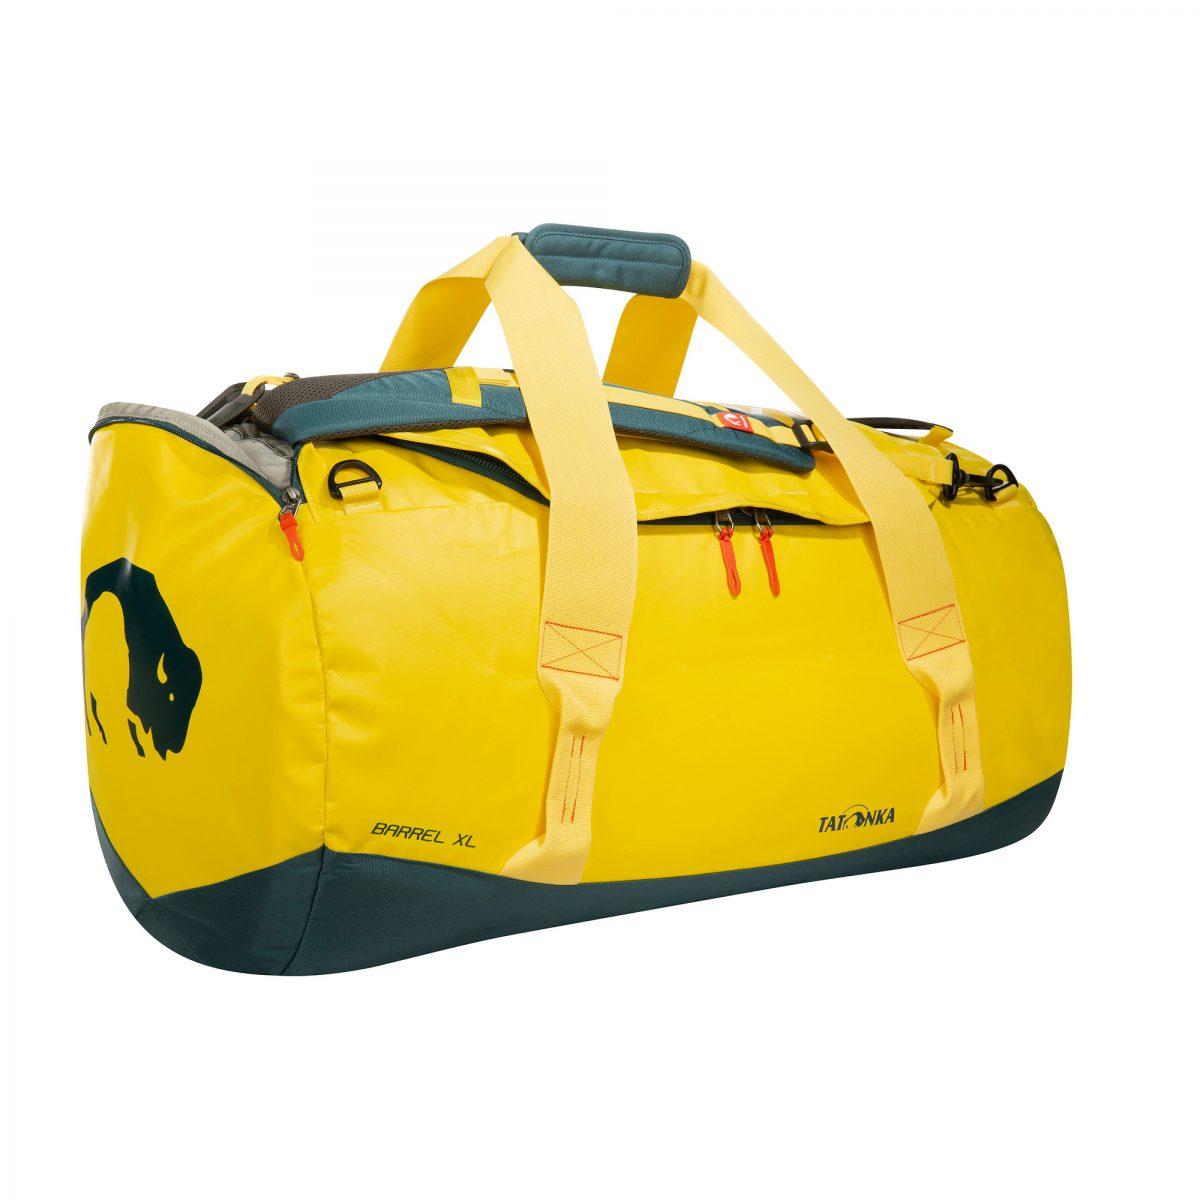 Picture of Tatonka Barrel XL Travel Bag - solid yellow